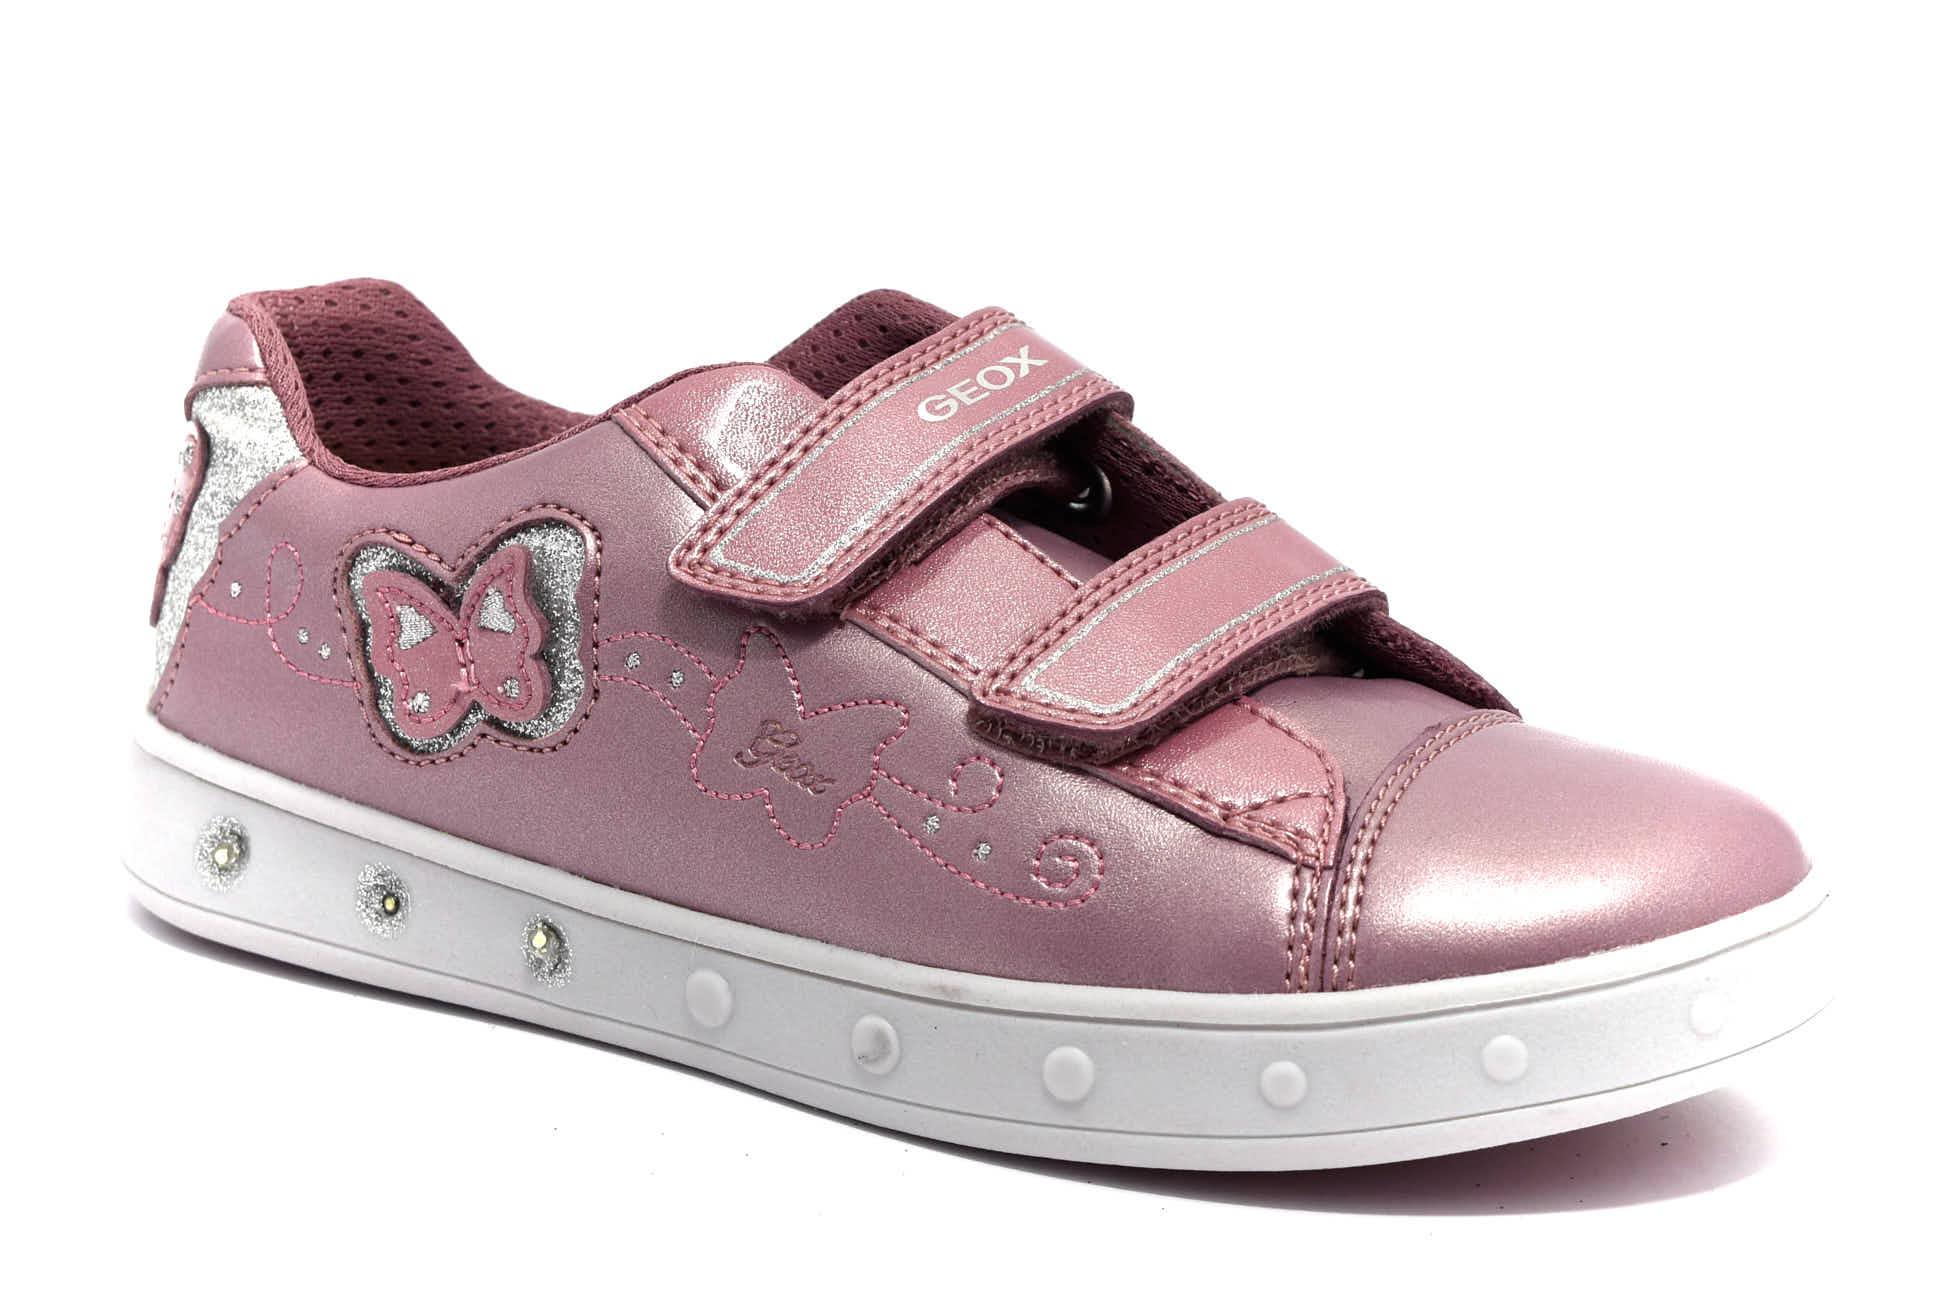 GEOX J948WC 0NFKN C8007 Scarpe Bambina Luci | shoesmyfriends.it